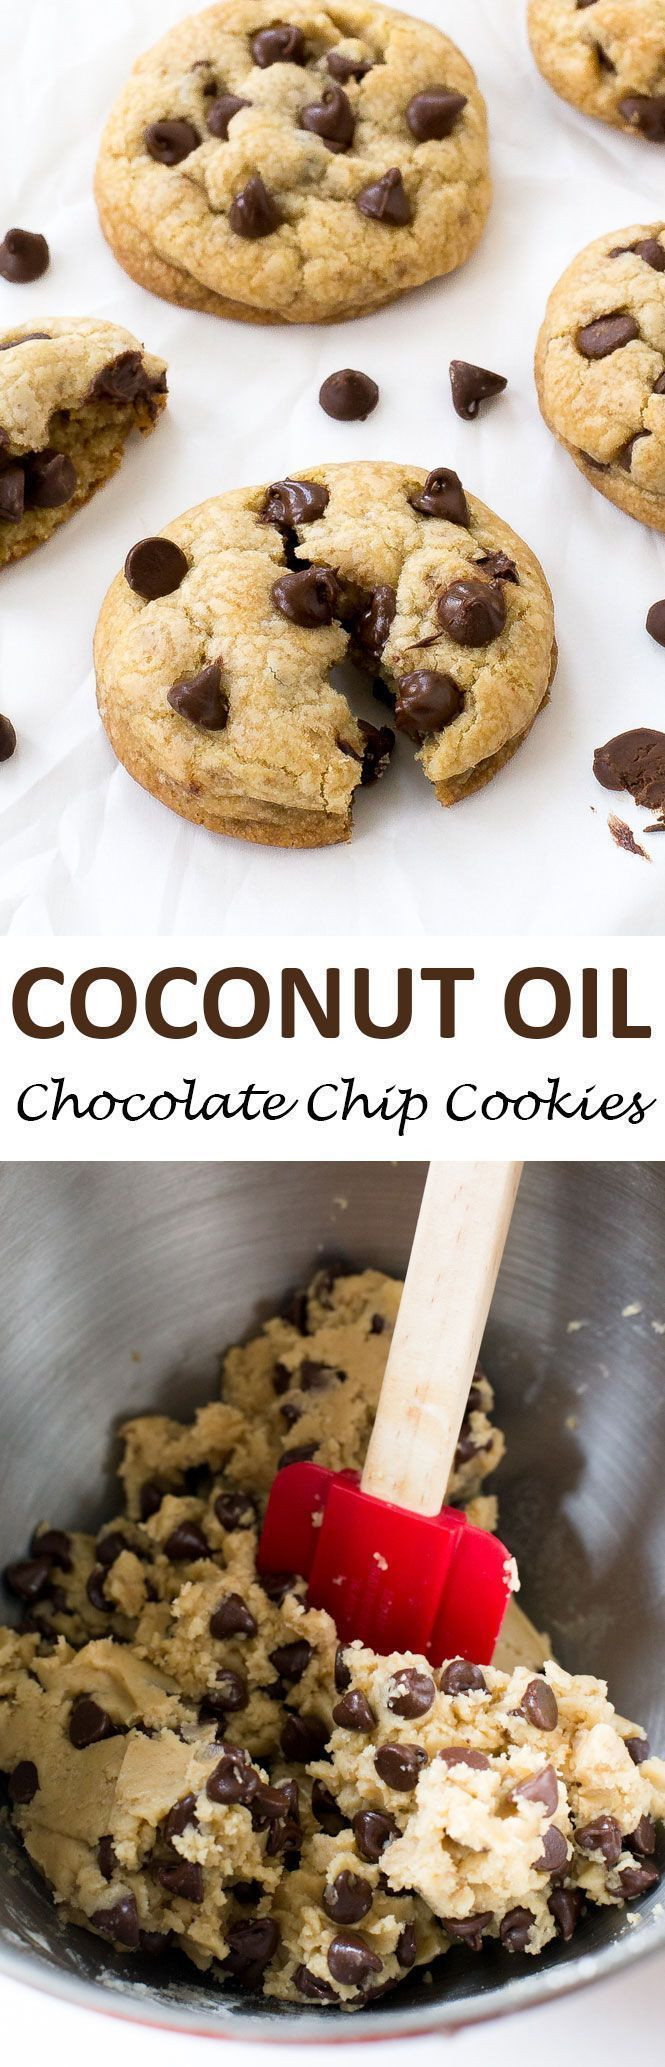 Coconut Oil Desserts  17 Best images about Dessert Recipes on Pinterest